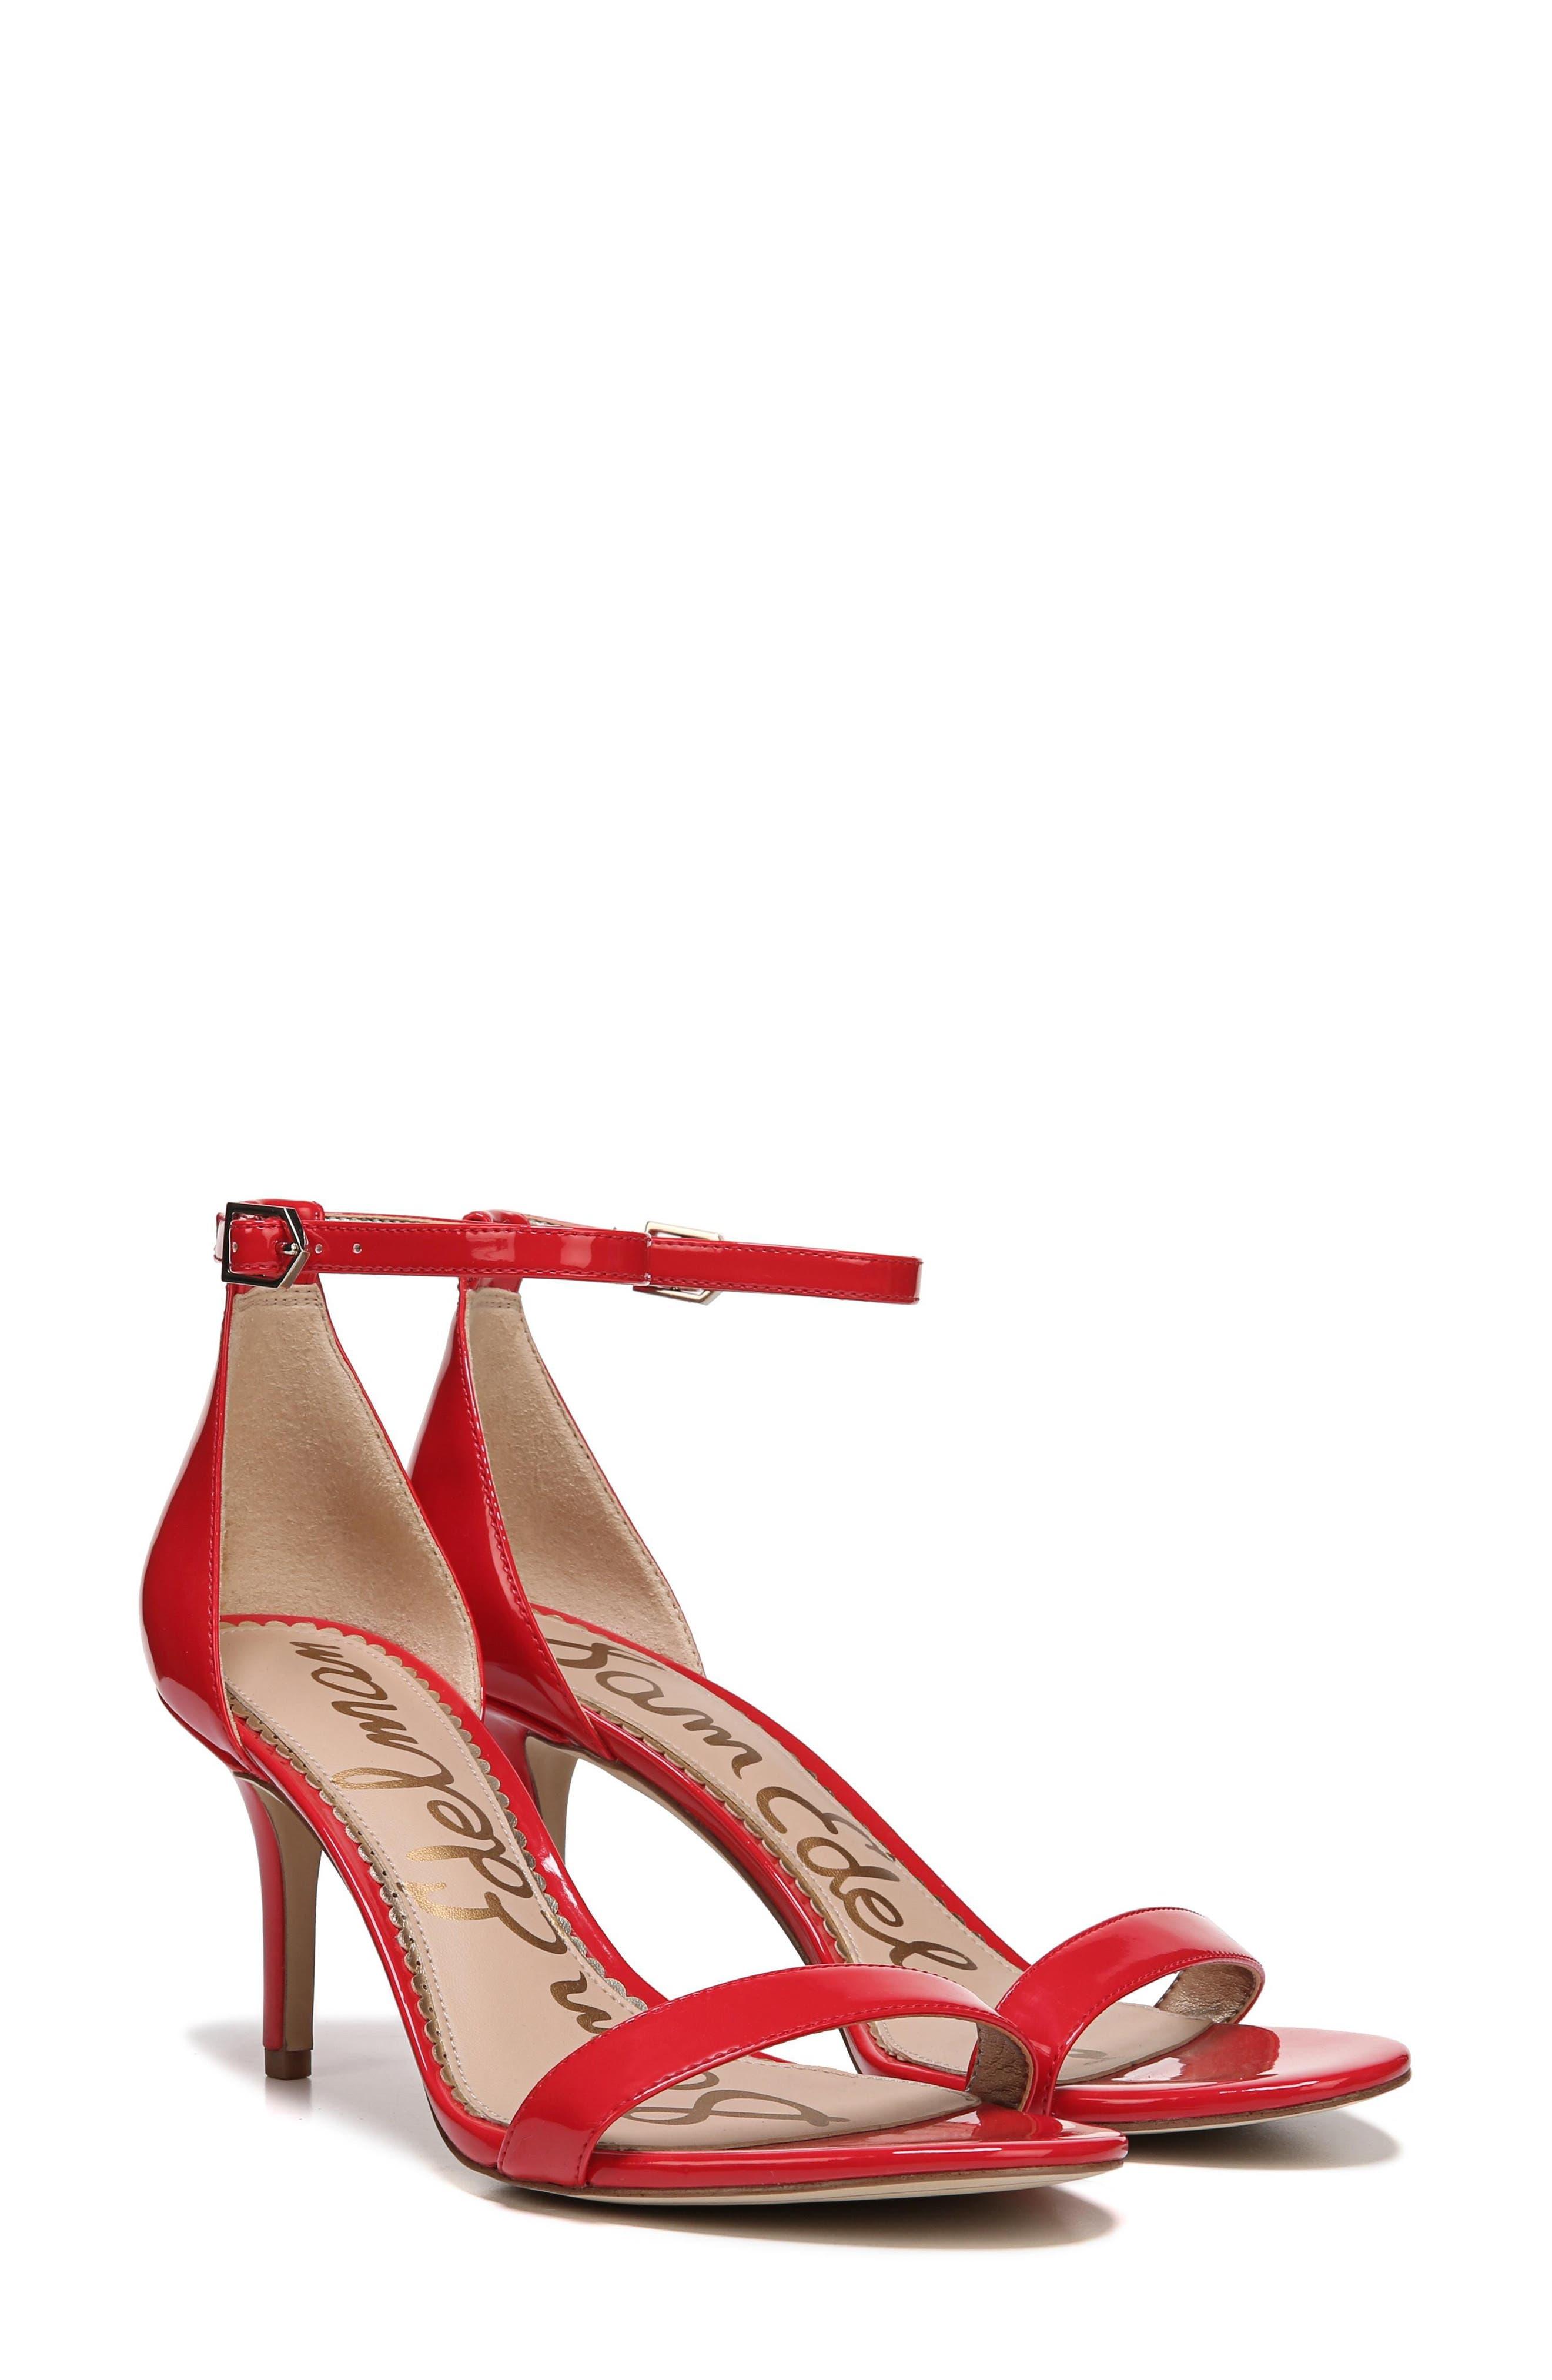 ,                             'Patti' Ankle Strap Sandal,                             Alternate thumbnail 120, color,                             606